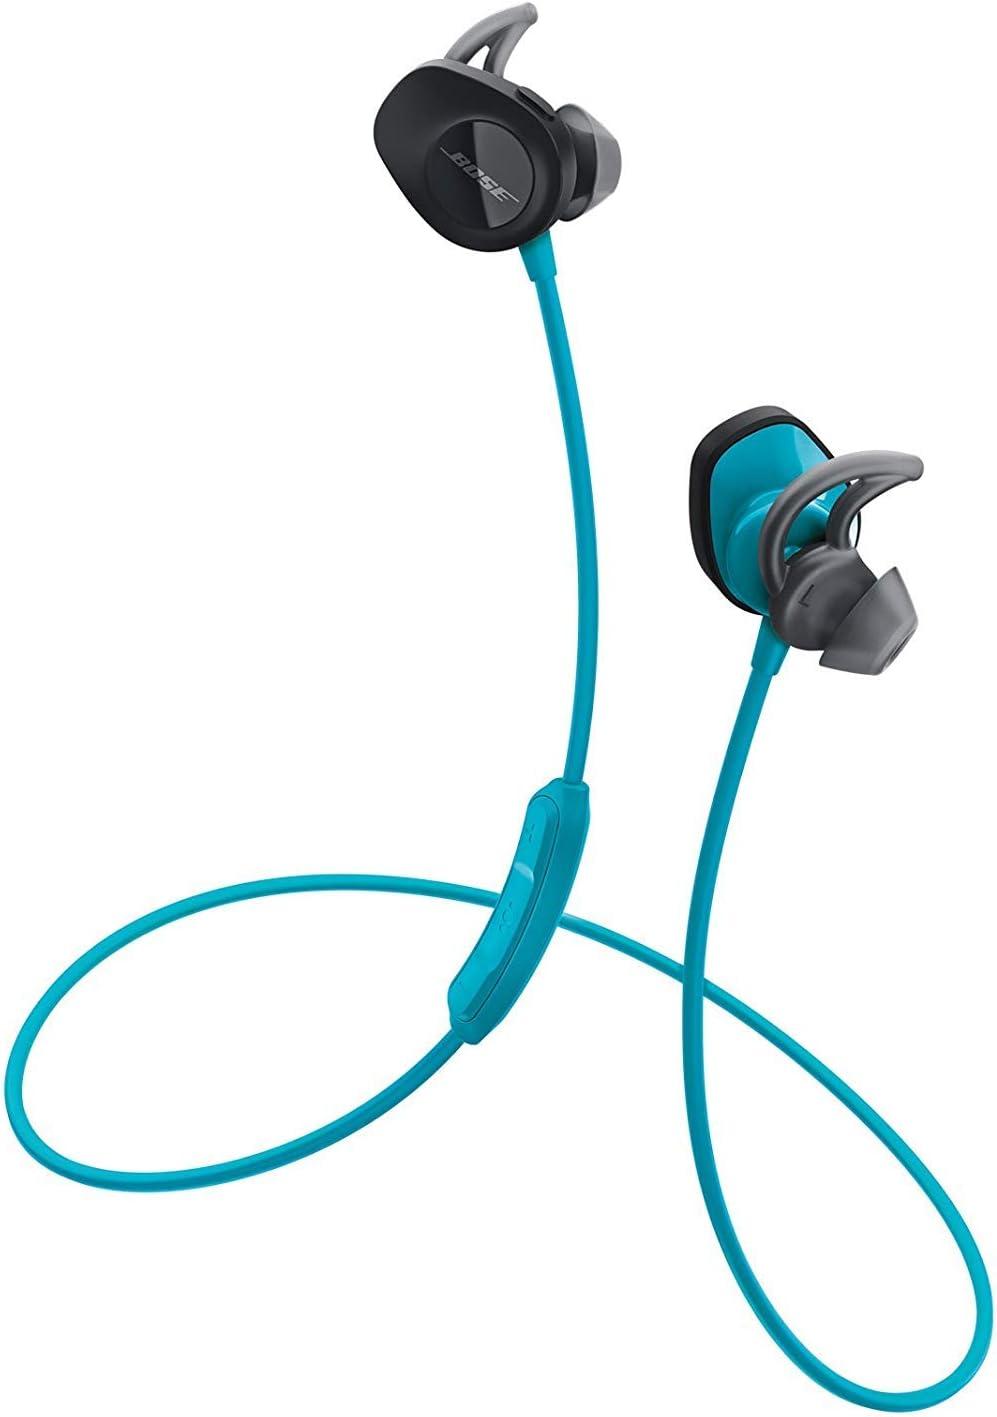 Bose SoundSport - Auriculares inalámbricos (Bluetooth, NFC, micrófono), color azul